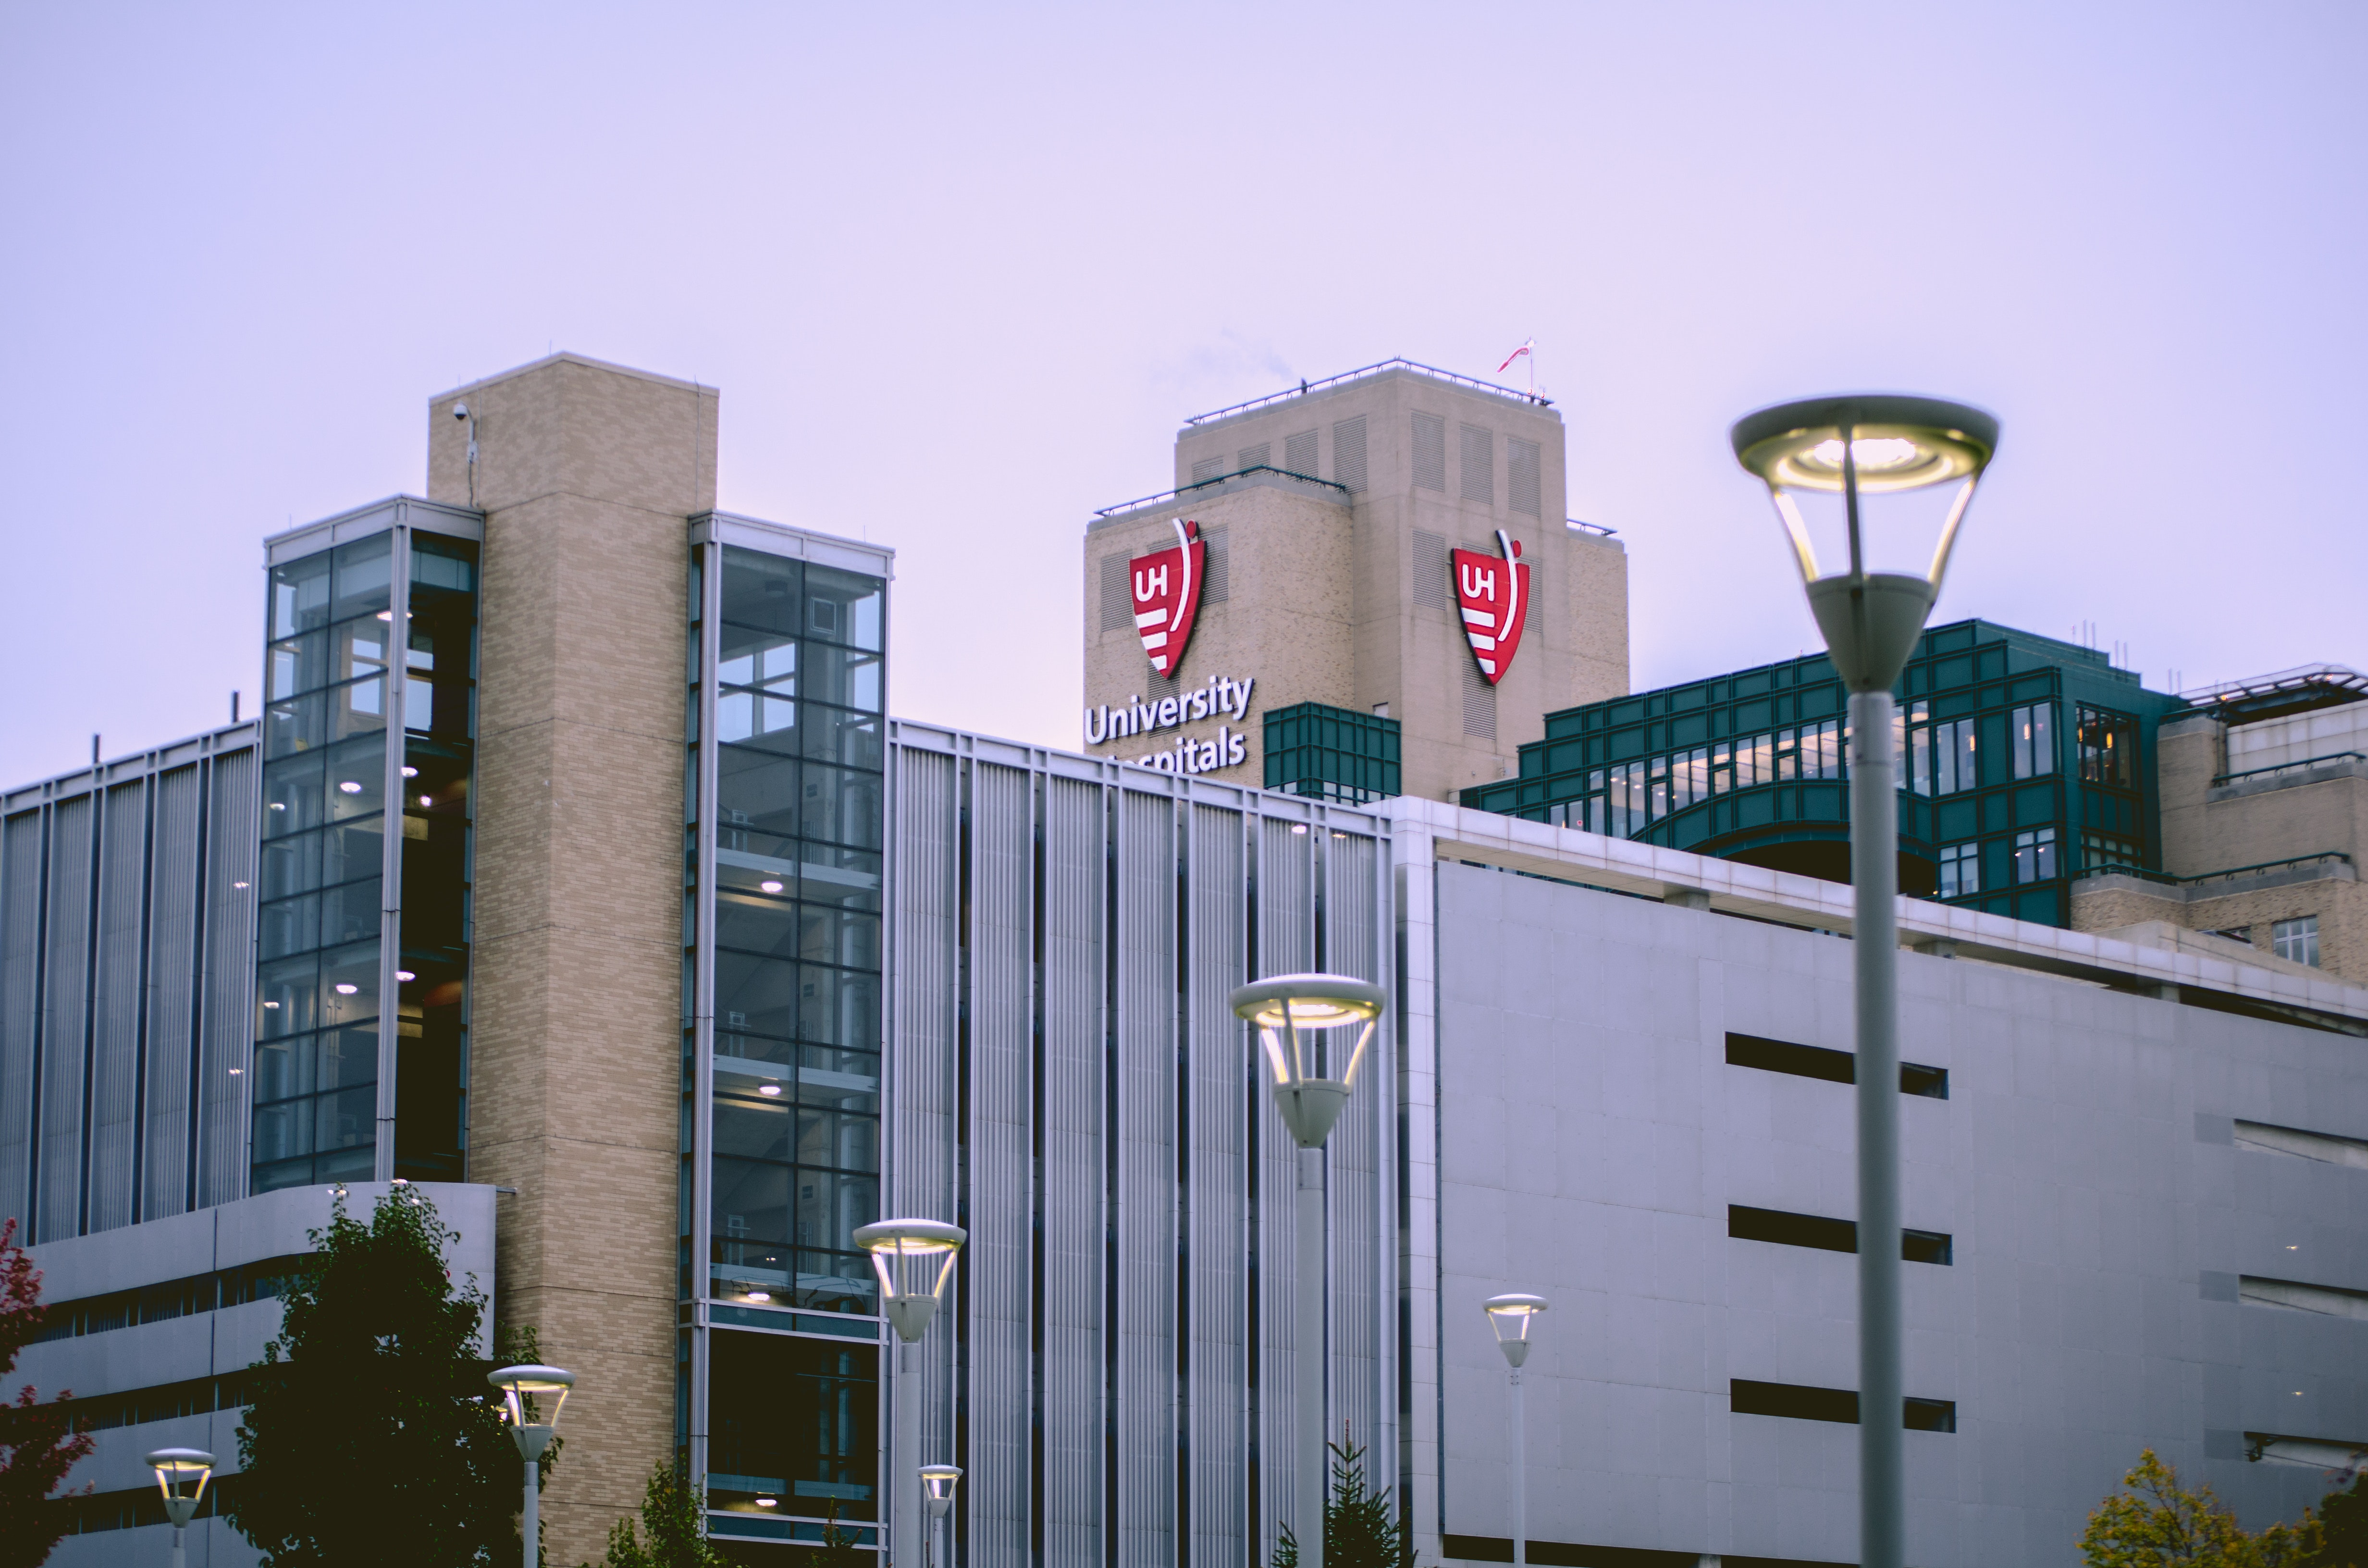 University Hospitals building